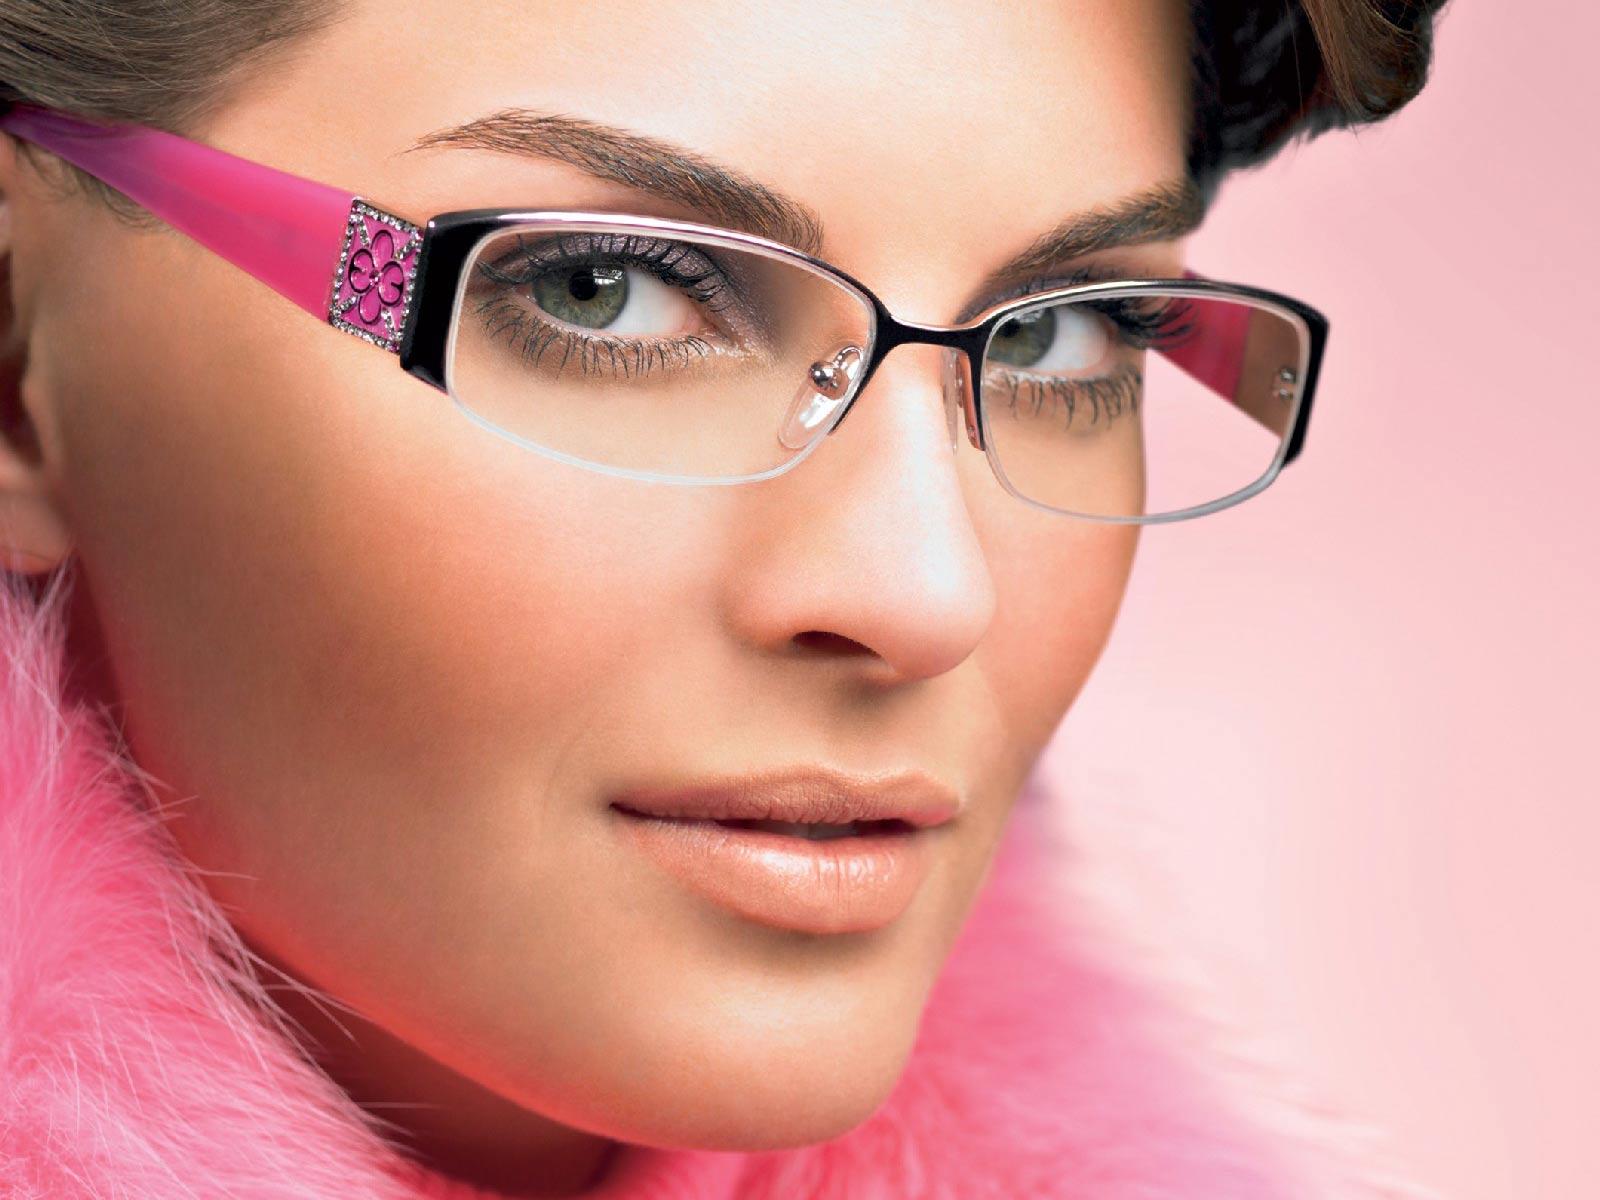 http://3.bp.blogspot.com/-dAuGhCvb0VI/Txhw77fWTCI/AAAAAAAAAmE/Emm8E66dfik/s1600/glasses+8.jpg